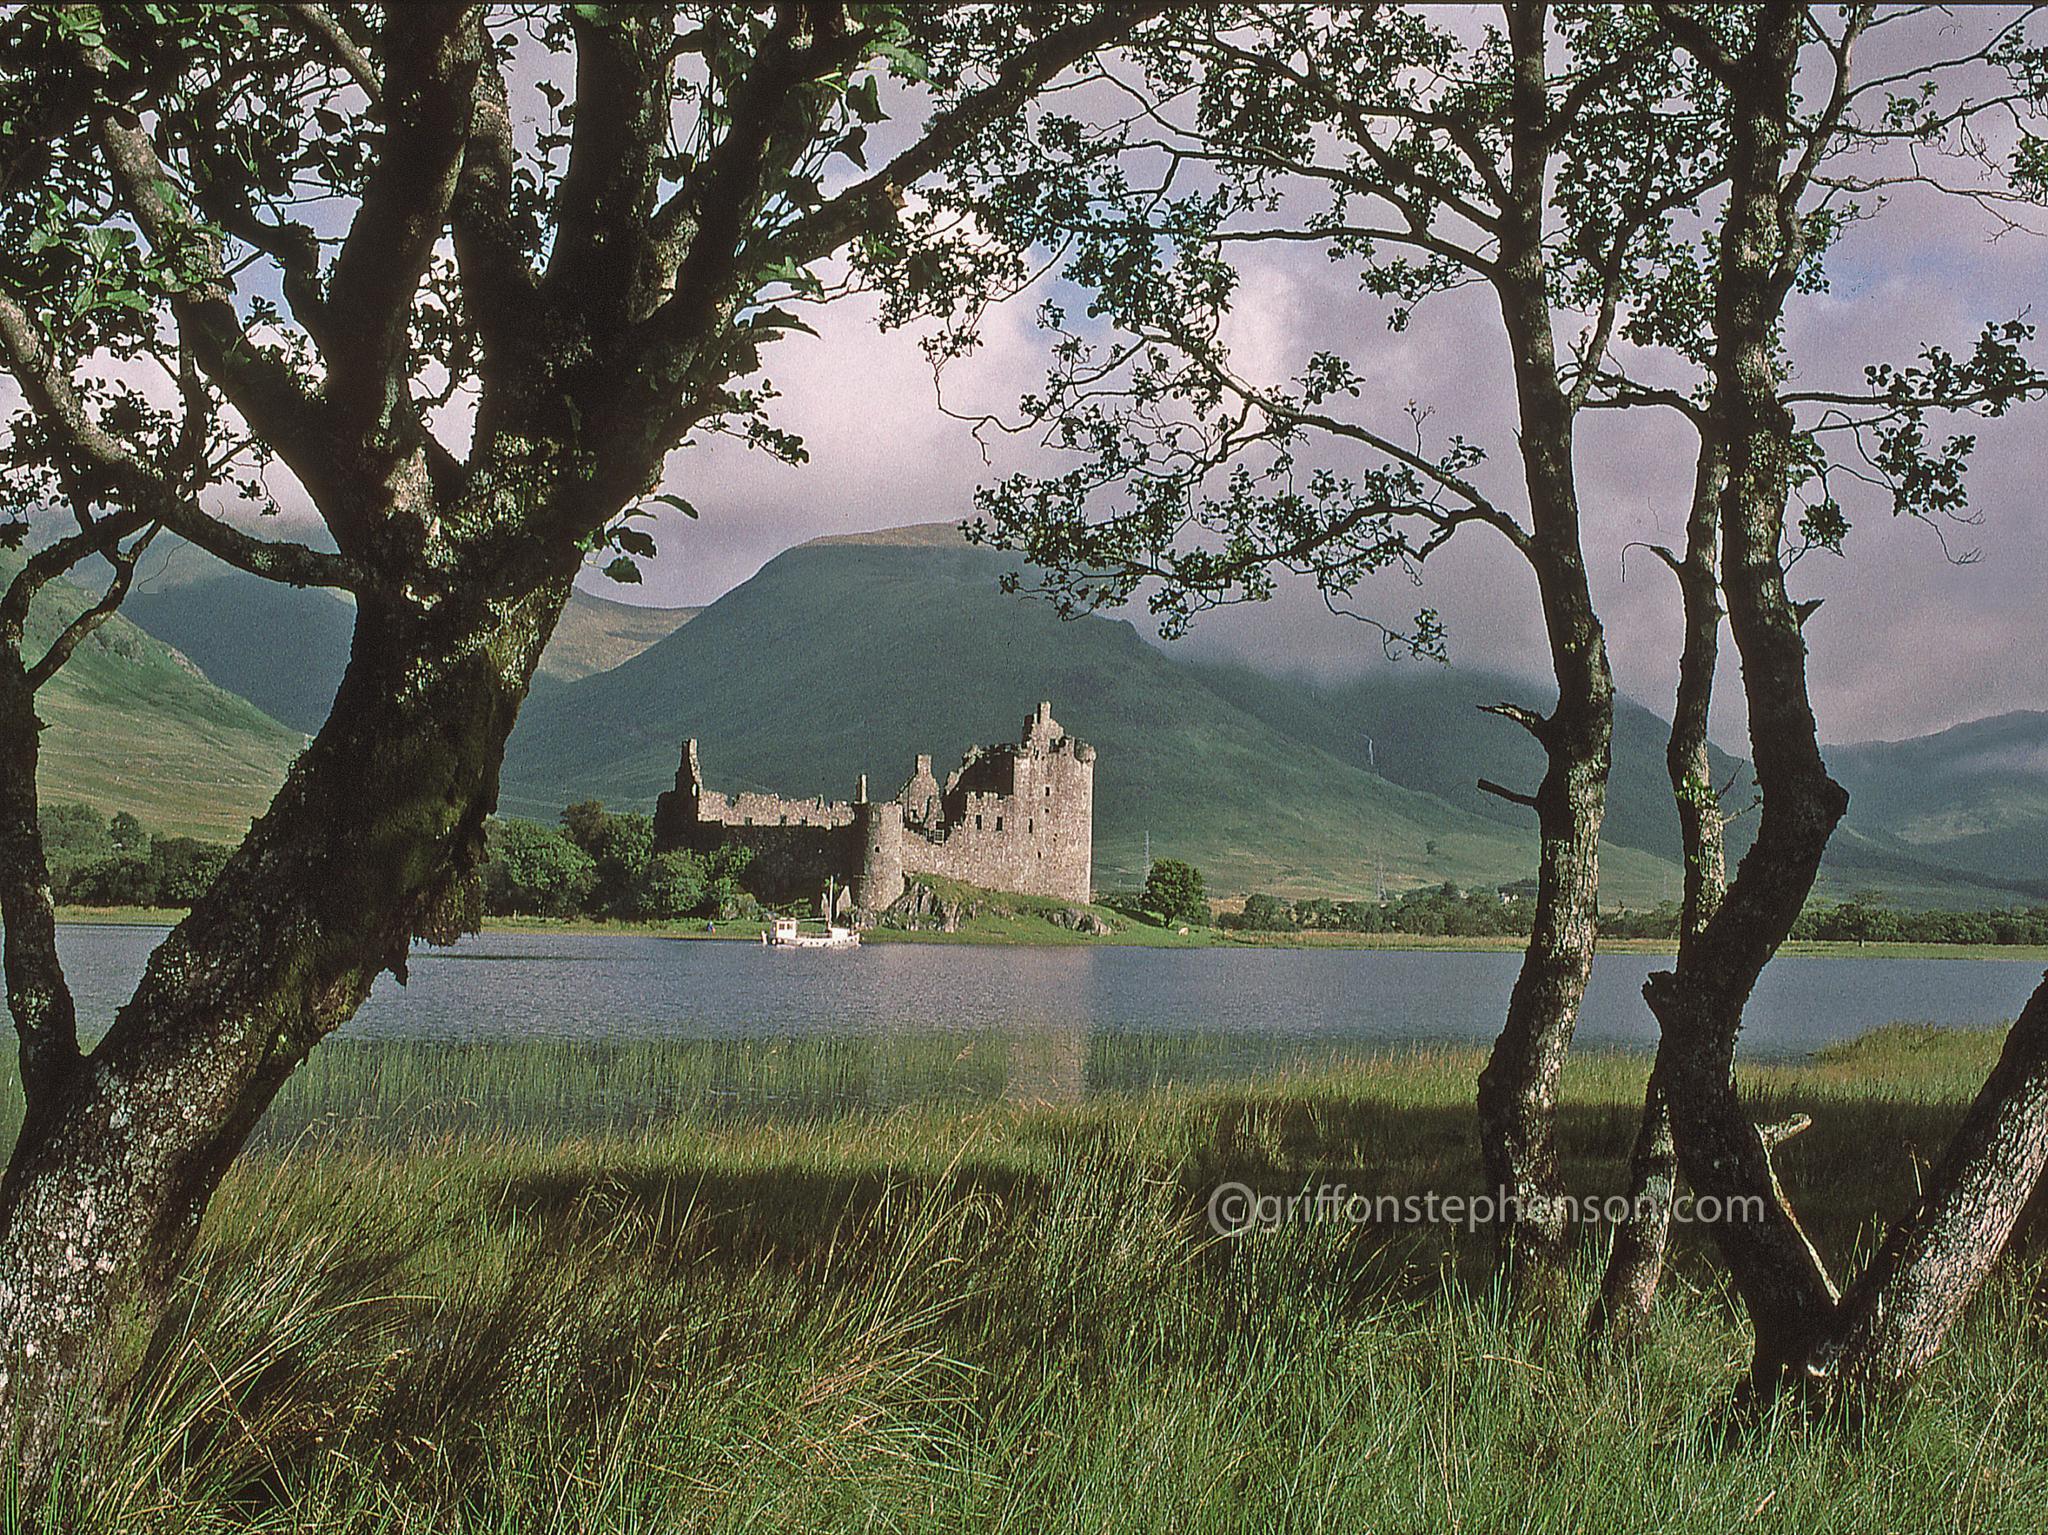 Lochside Guardian by Thomas Dyer@griffonstephenson.com